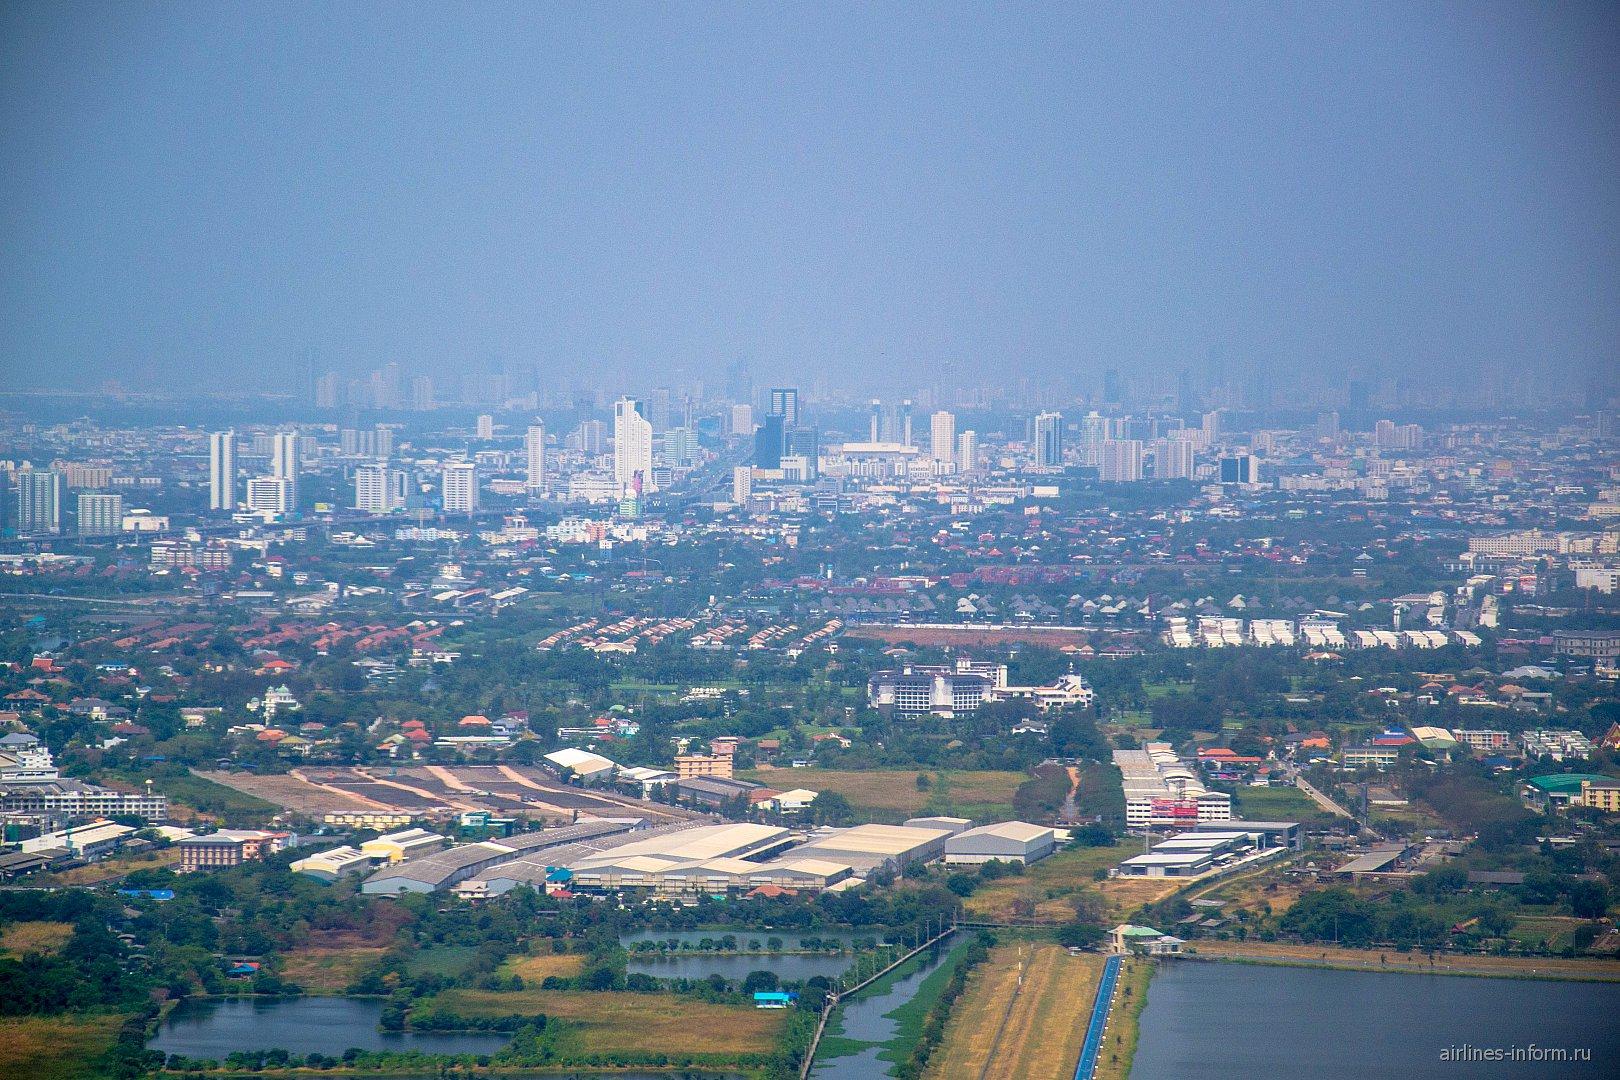 Вид на Бангкок при взлете из аэропорта Суварнабхуми